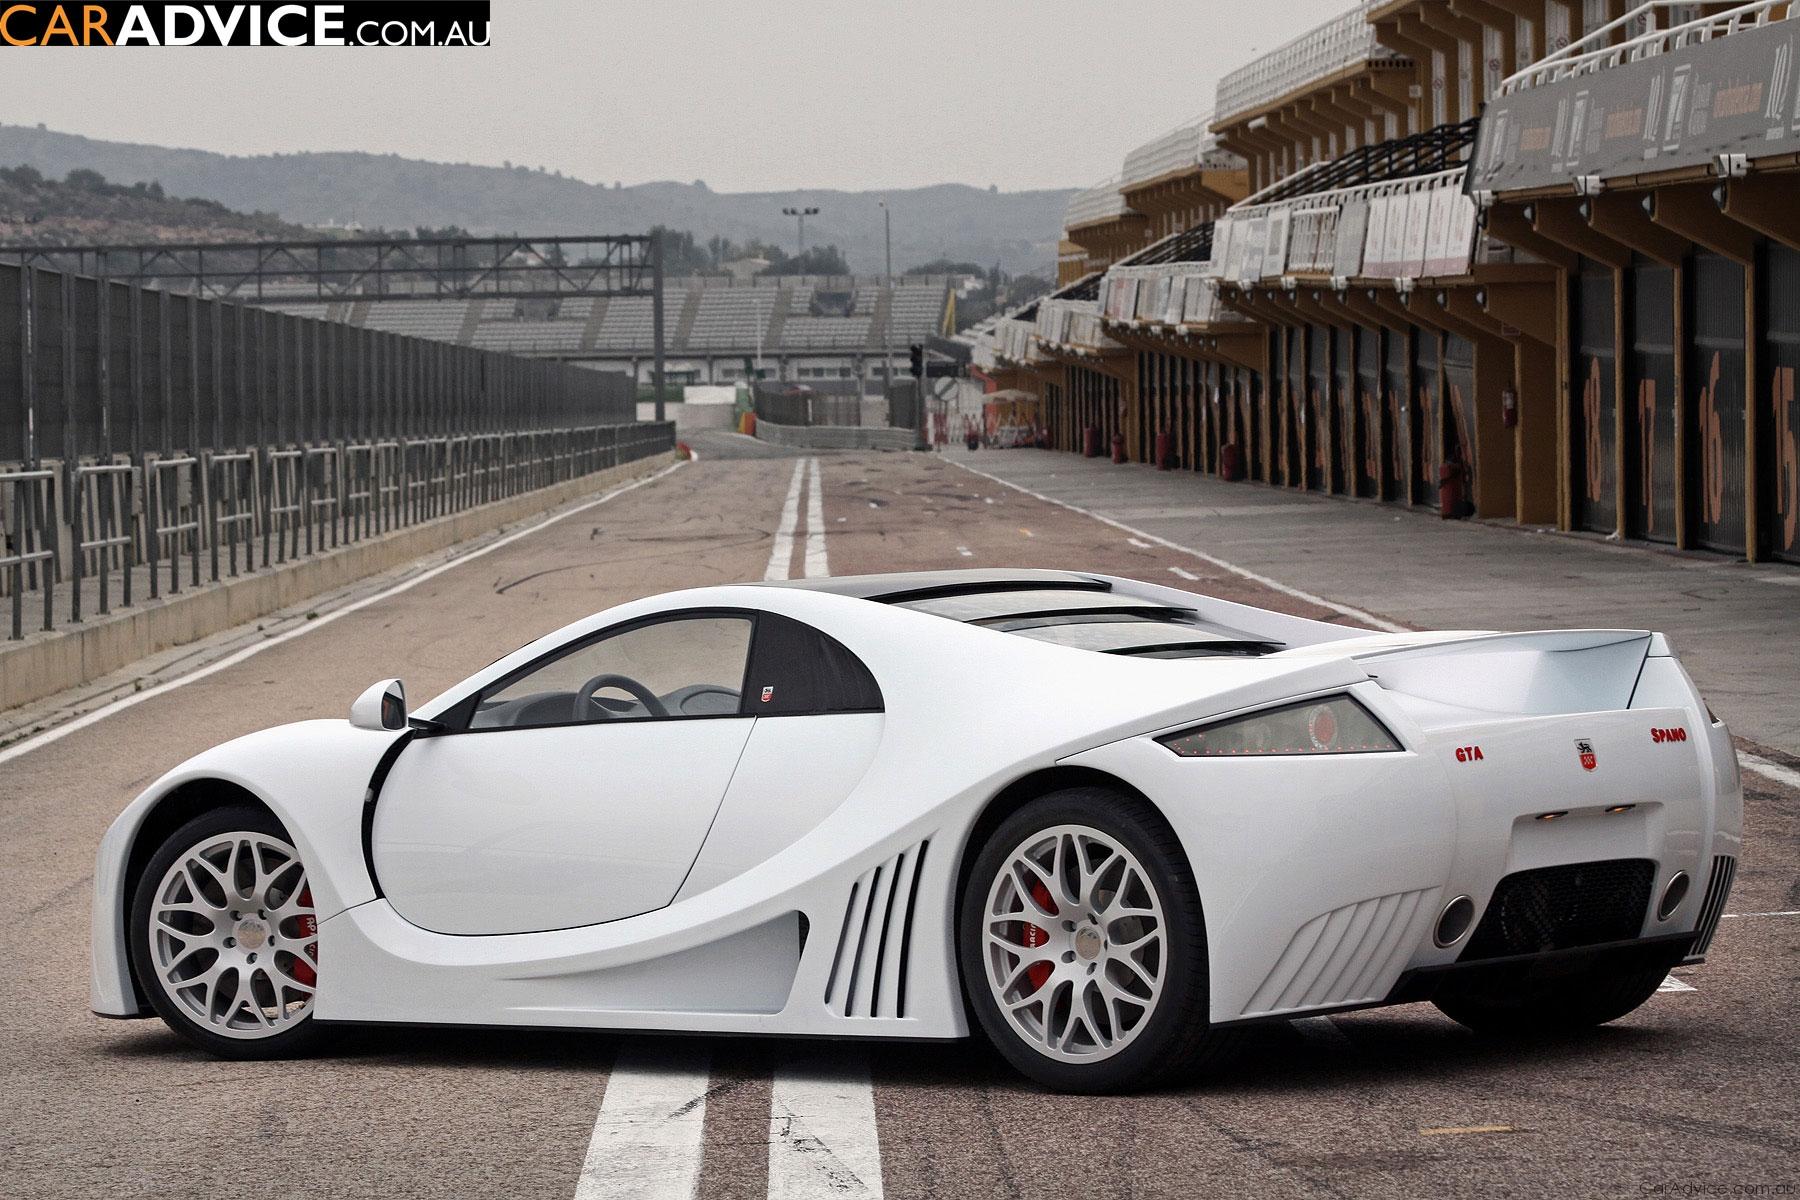 Gta spano review photos caradvice for Max motor dreams cost